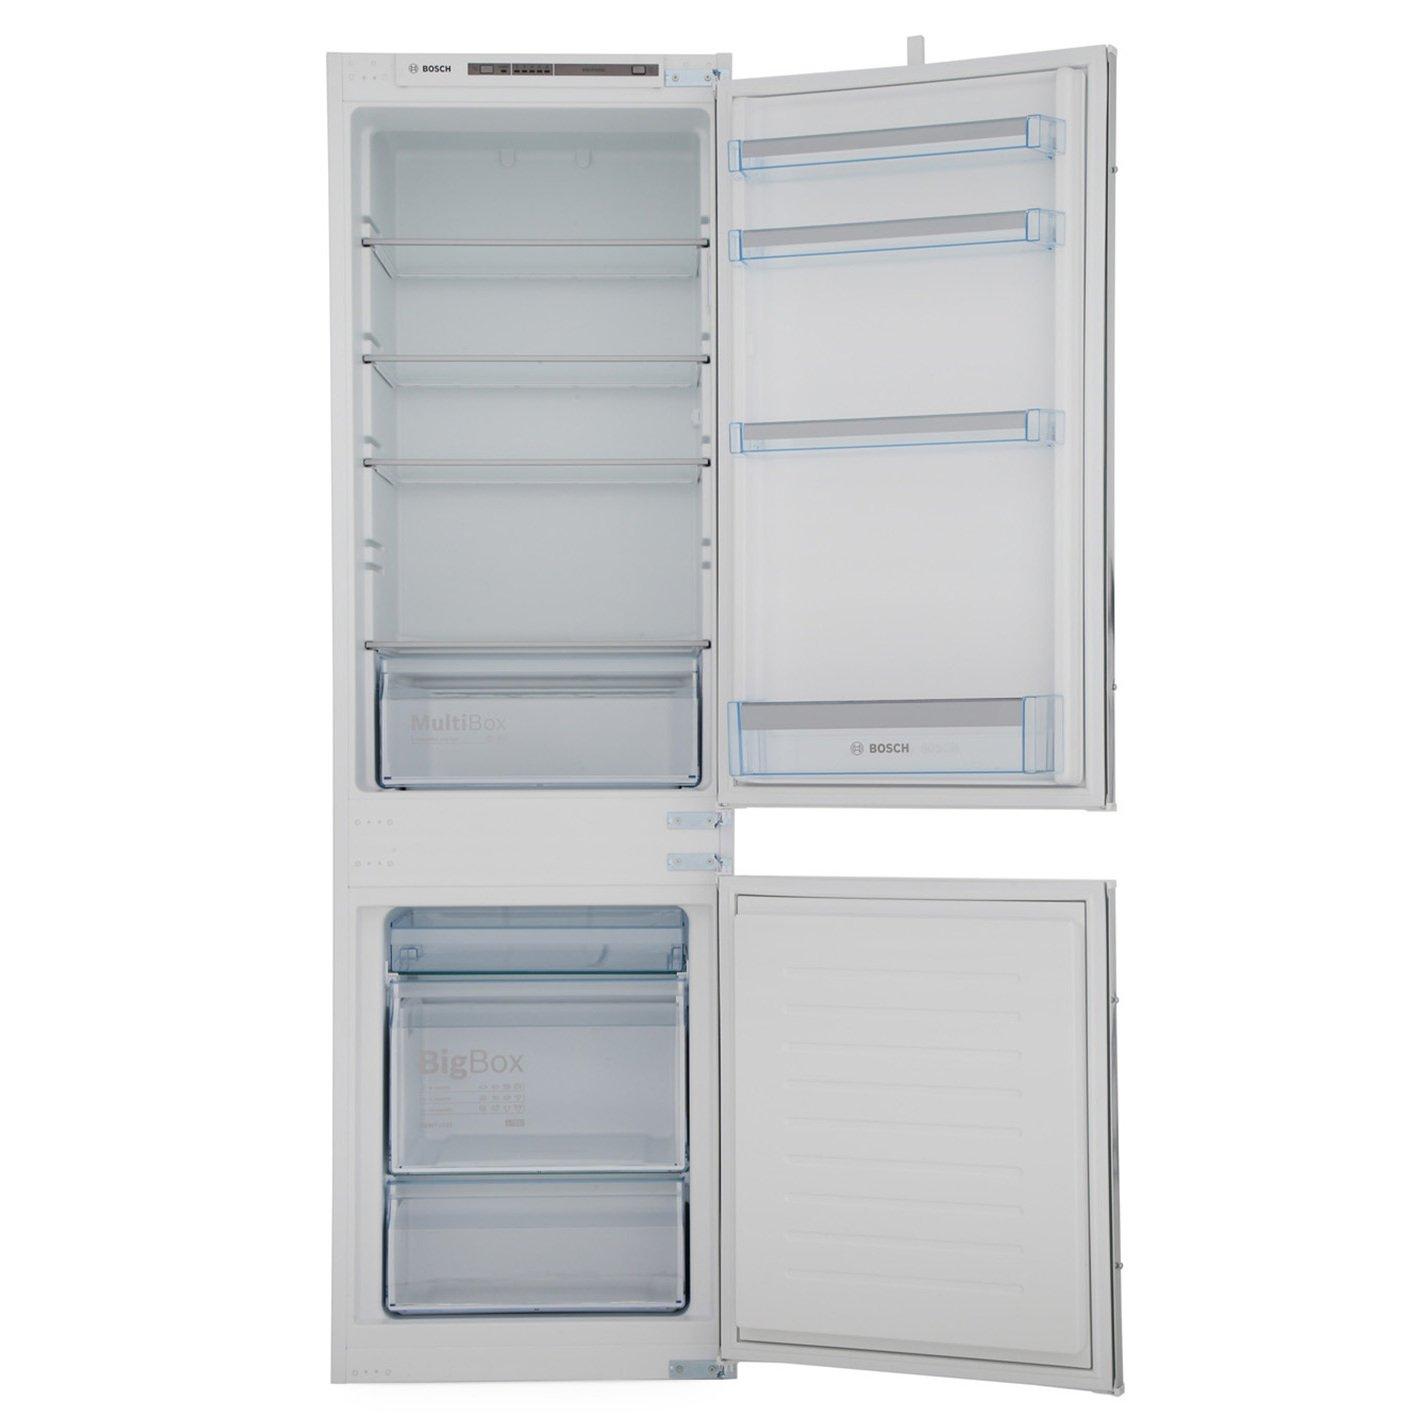 buy bosch serie 4 kiv86vs30g integrated fridge freezer kiv86vs30g white marks electrical. Black Bedroom Furniture Sets. Home Design Ideas